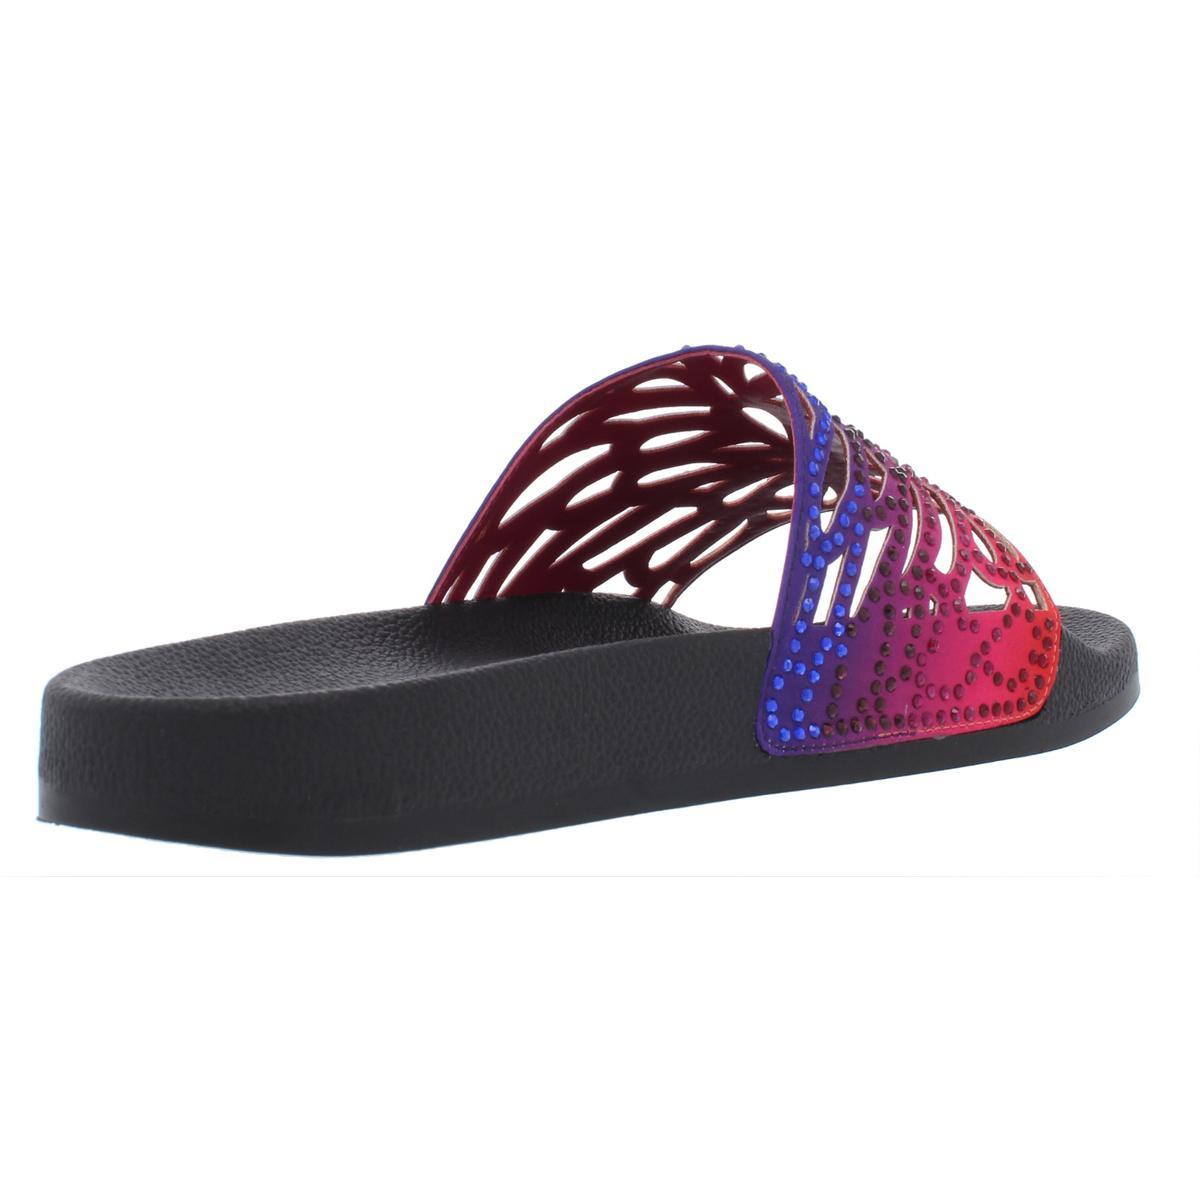 INC-Womens-Peymin22-Satin-Pool-Embellished-Slide-Sandals-Flats-BHFO-6450 thumbnail 4